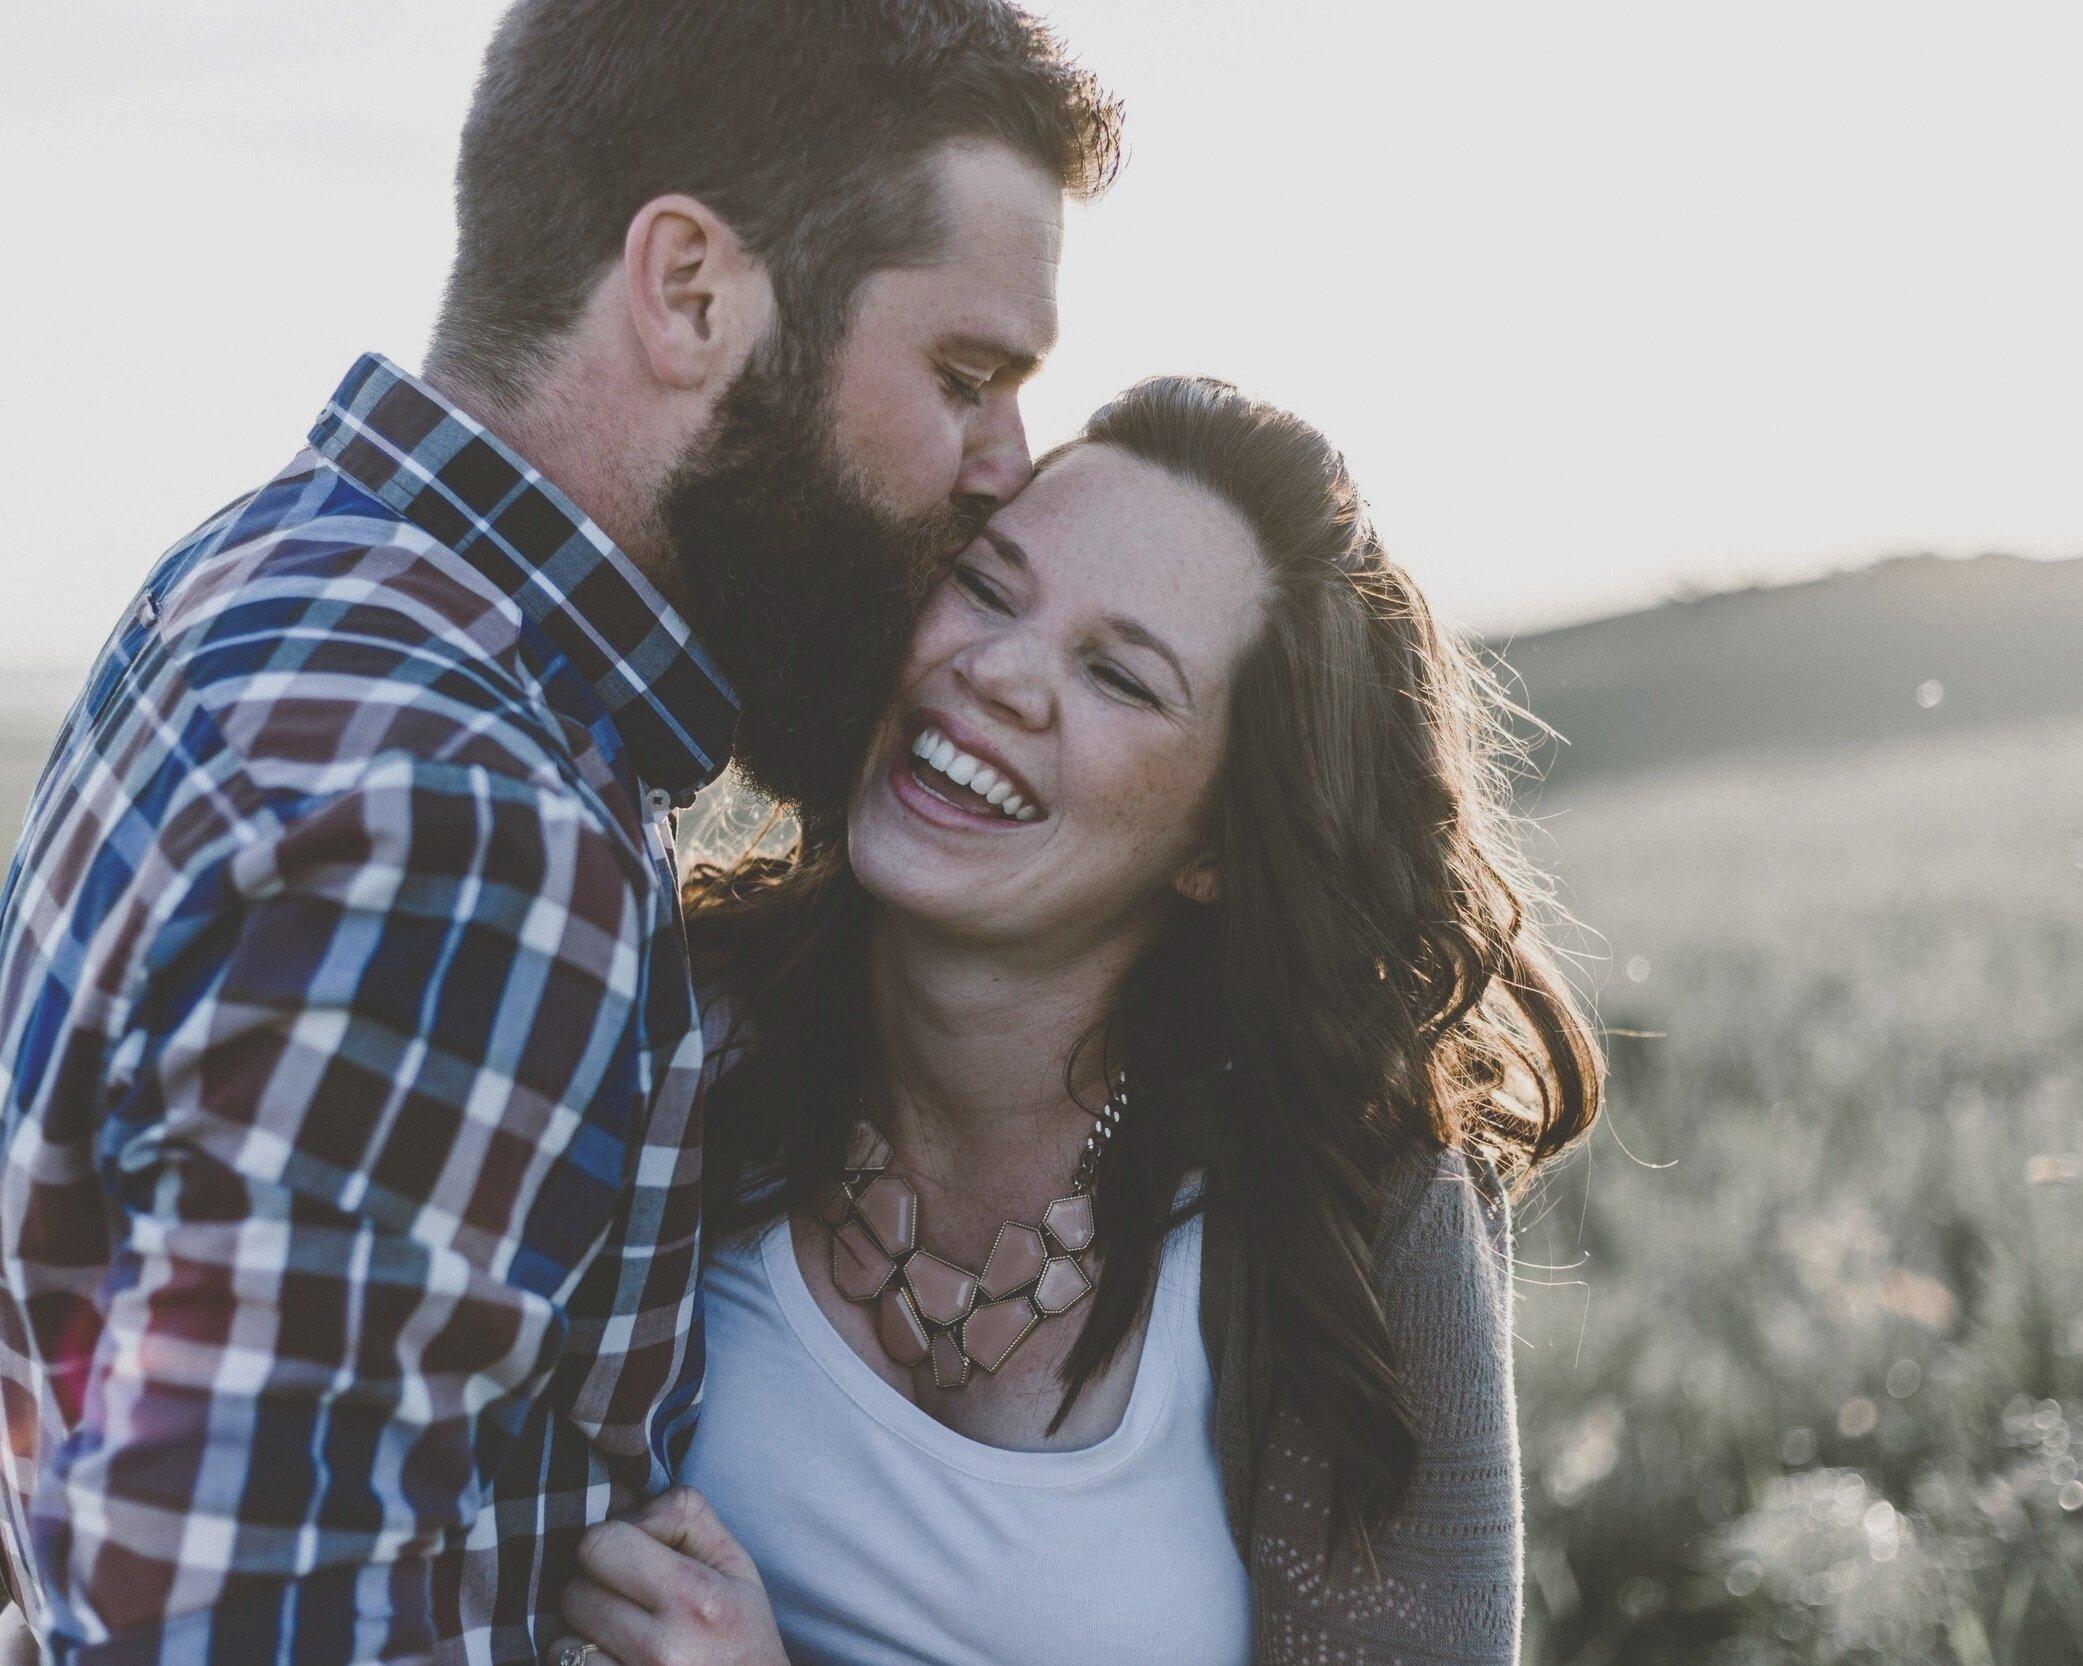 beard_smile_couple_in_field_priscilla-du-preez-318422-unsplash.jpg